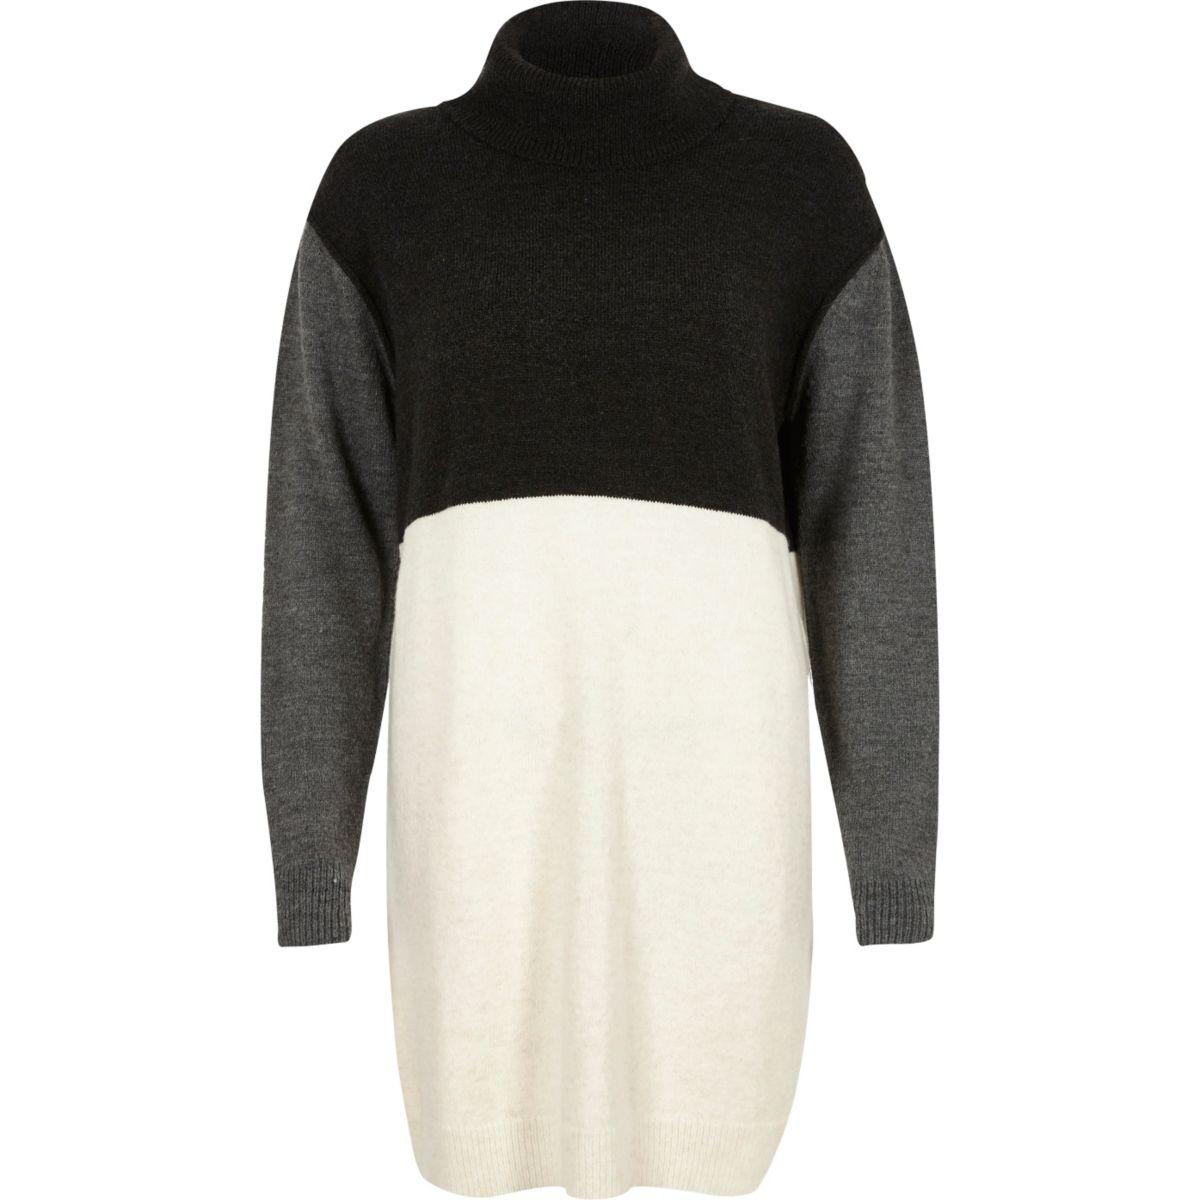 Grey colour block knitted jumper dress